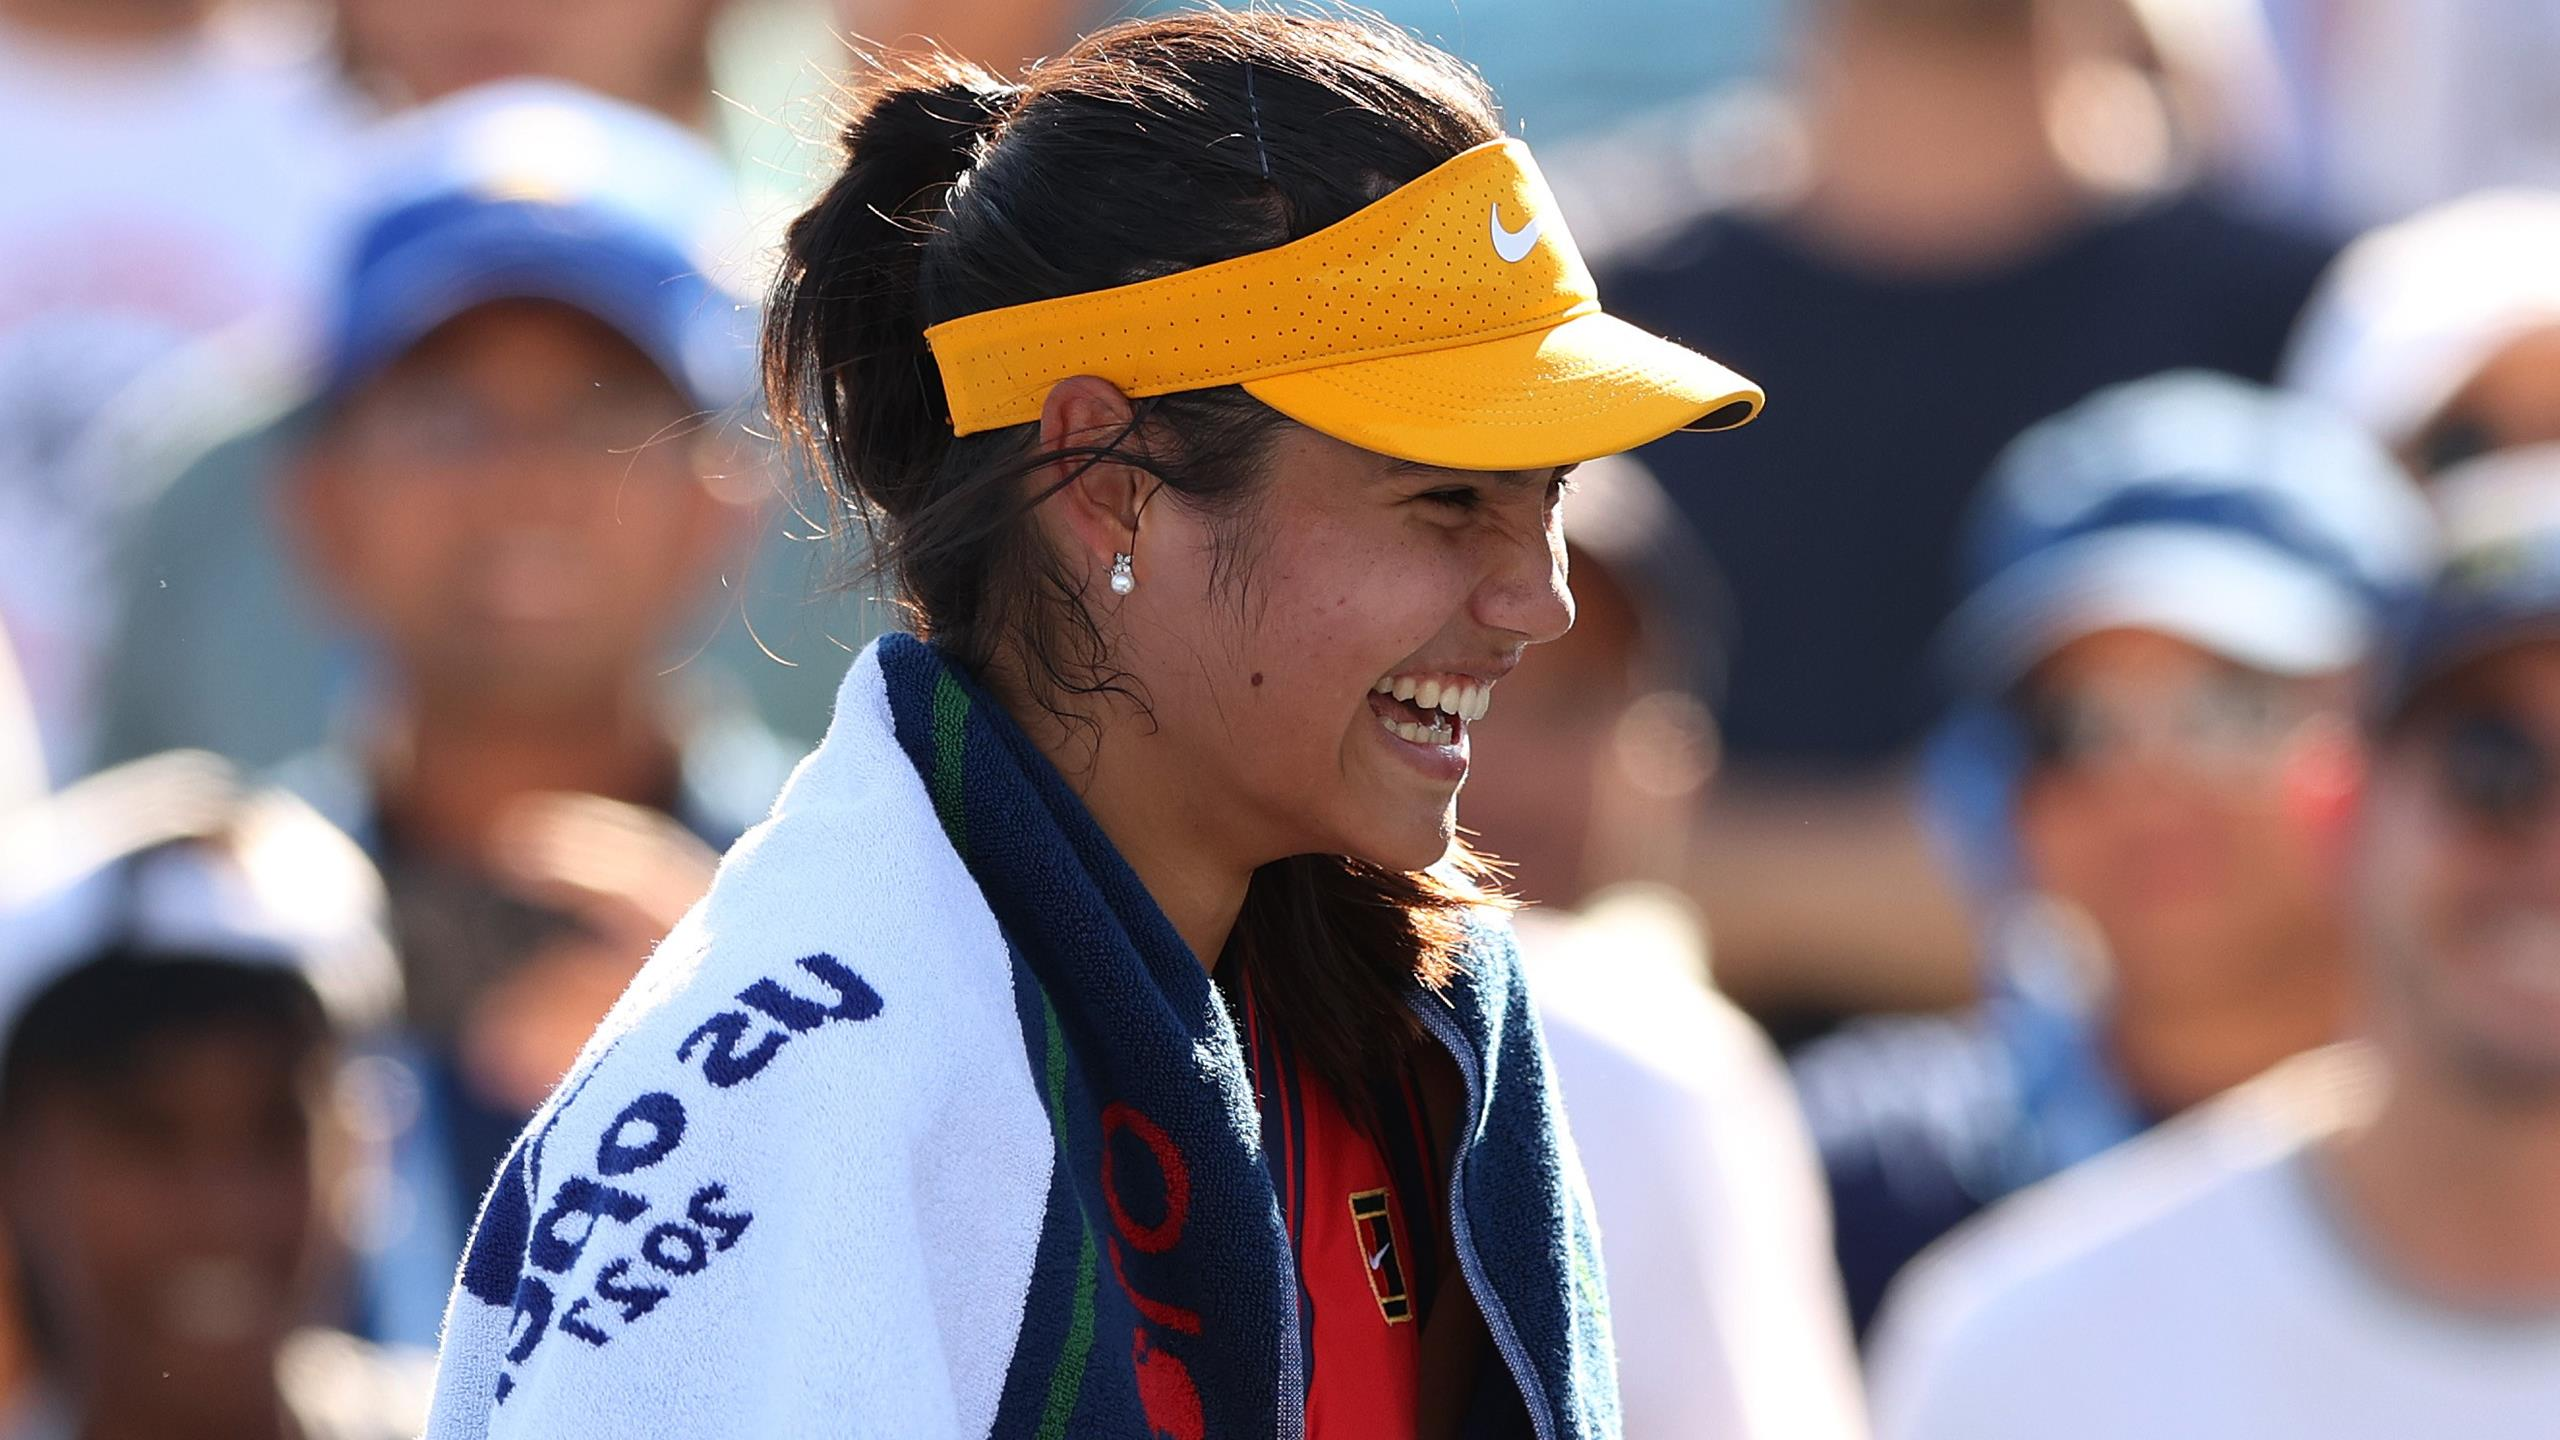 How far will 'fearless' Raducanu go at US Open?